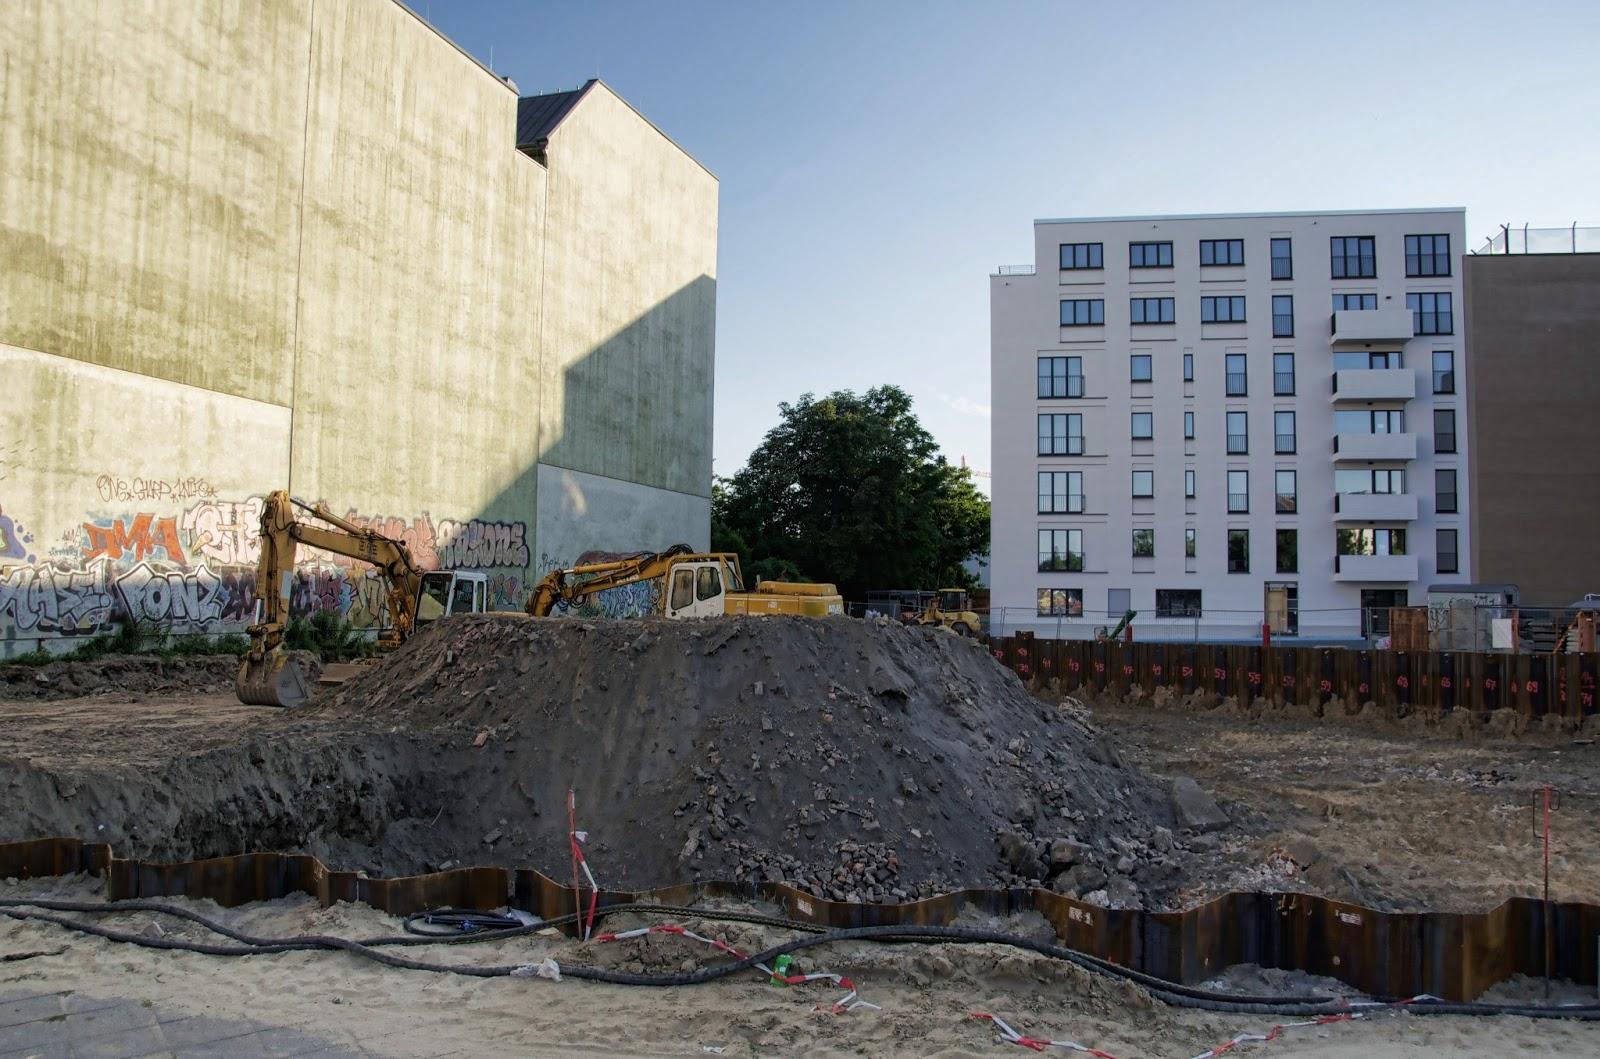 Merika Hotel Berlin